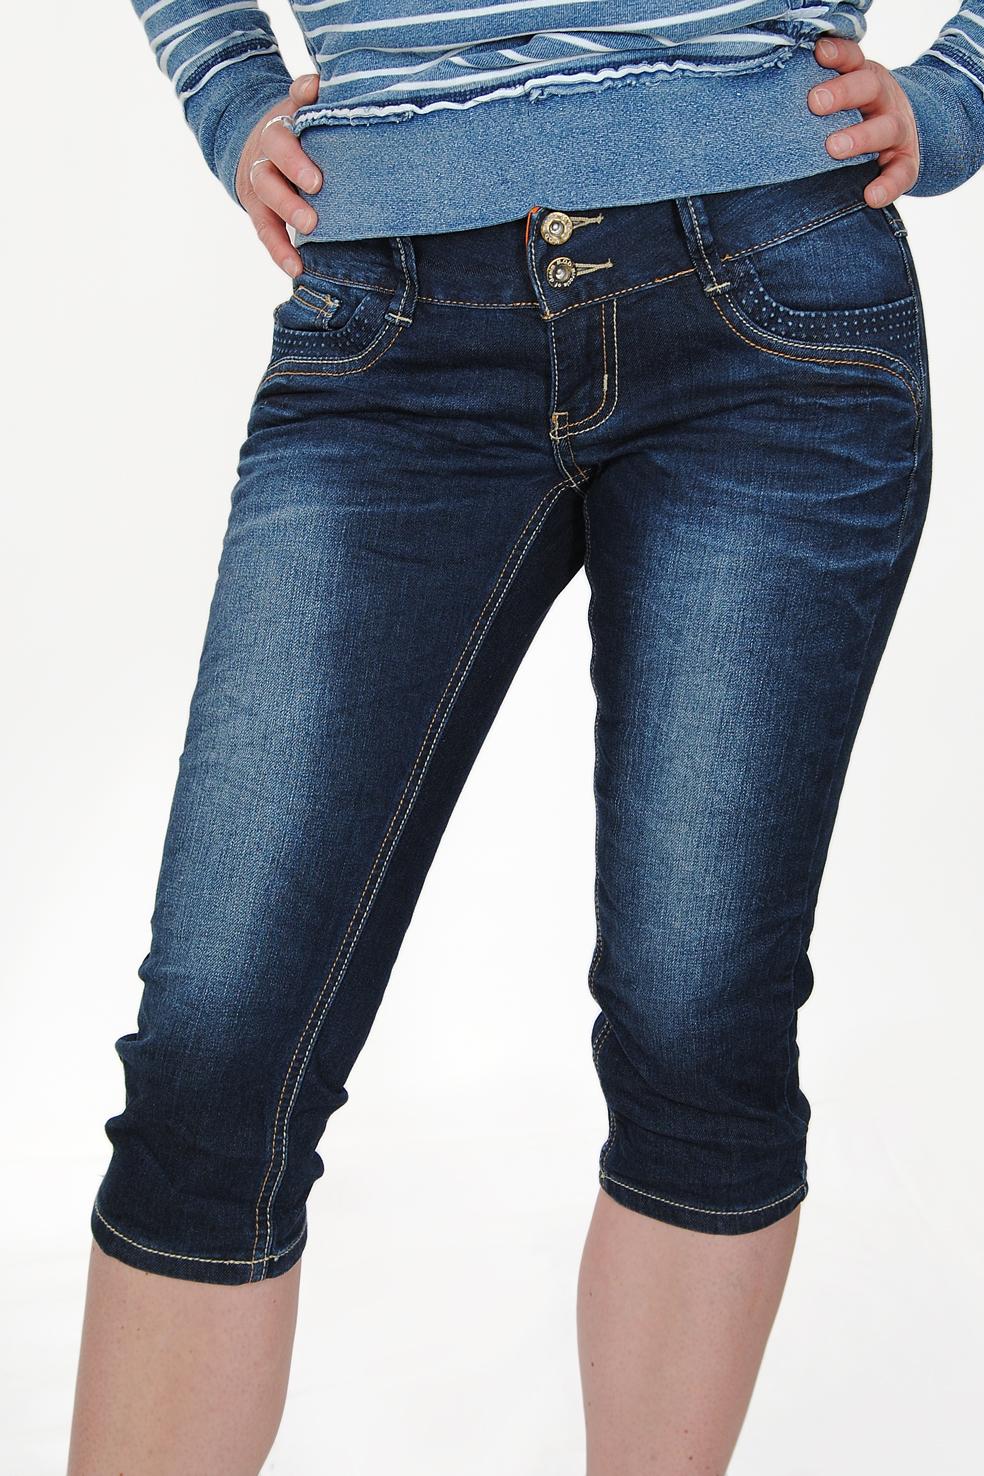 m o d damen capri jeans enni alamo blue ebay. Black Bedroom Furniture Sets. Home Design Ideas